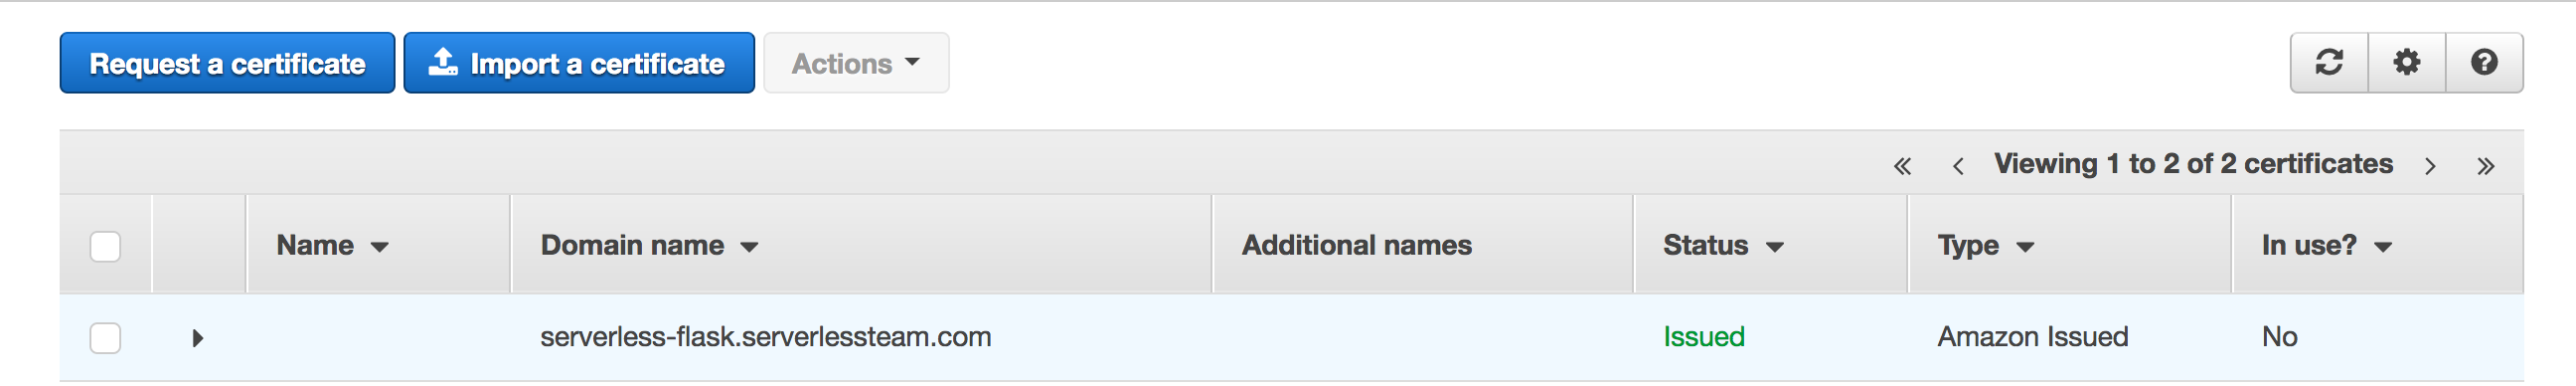 How to set up a custom domain name for Lambda & API Gateway